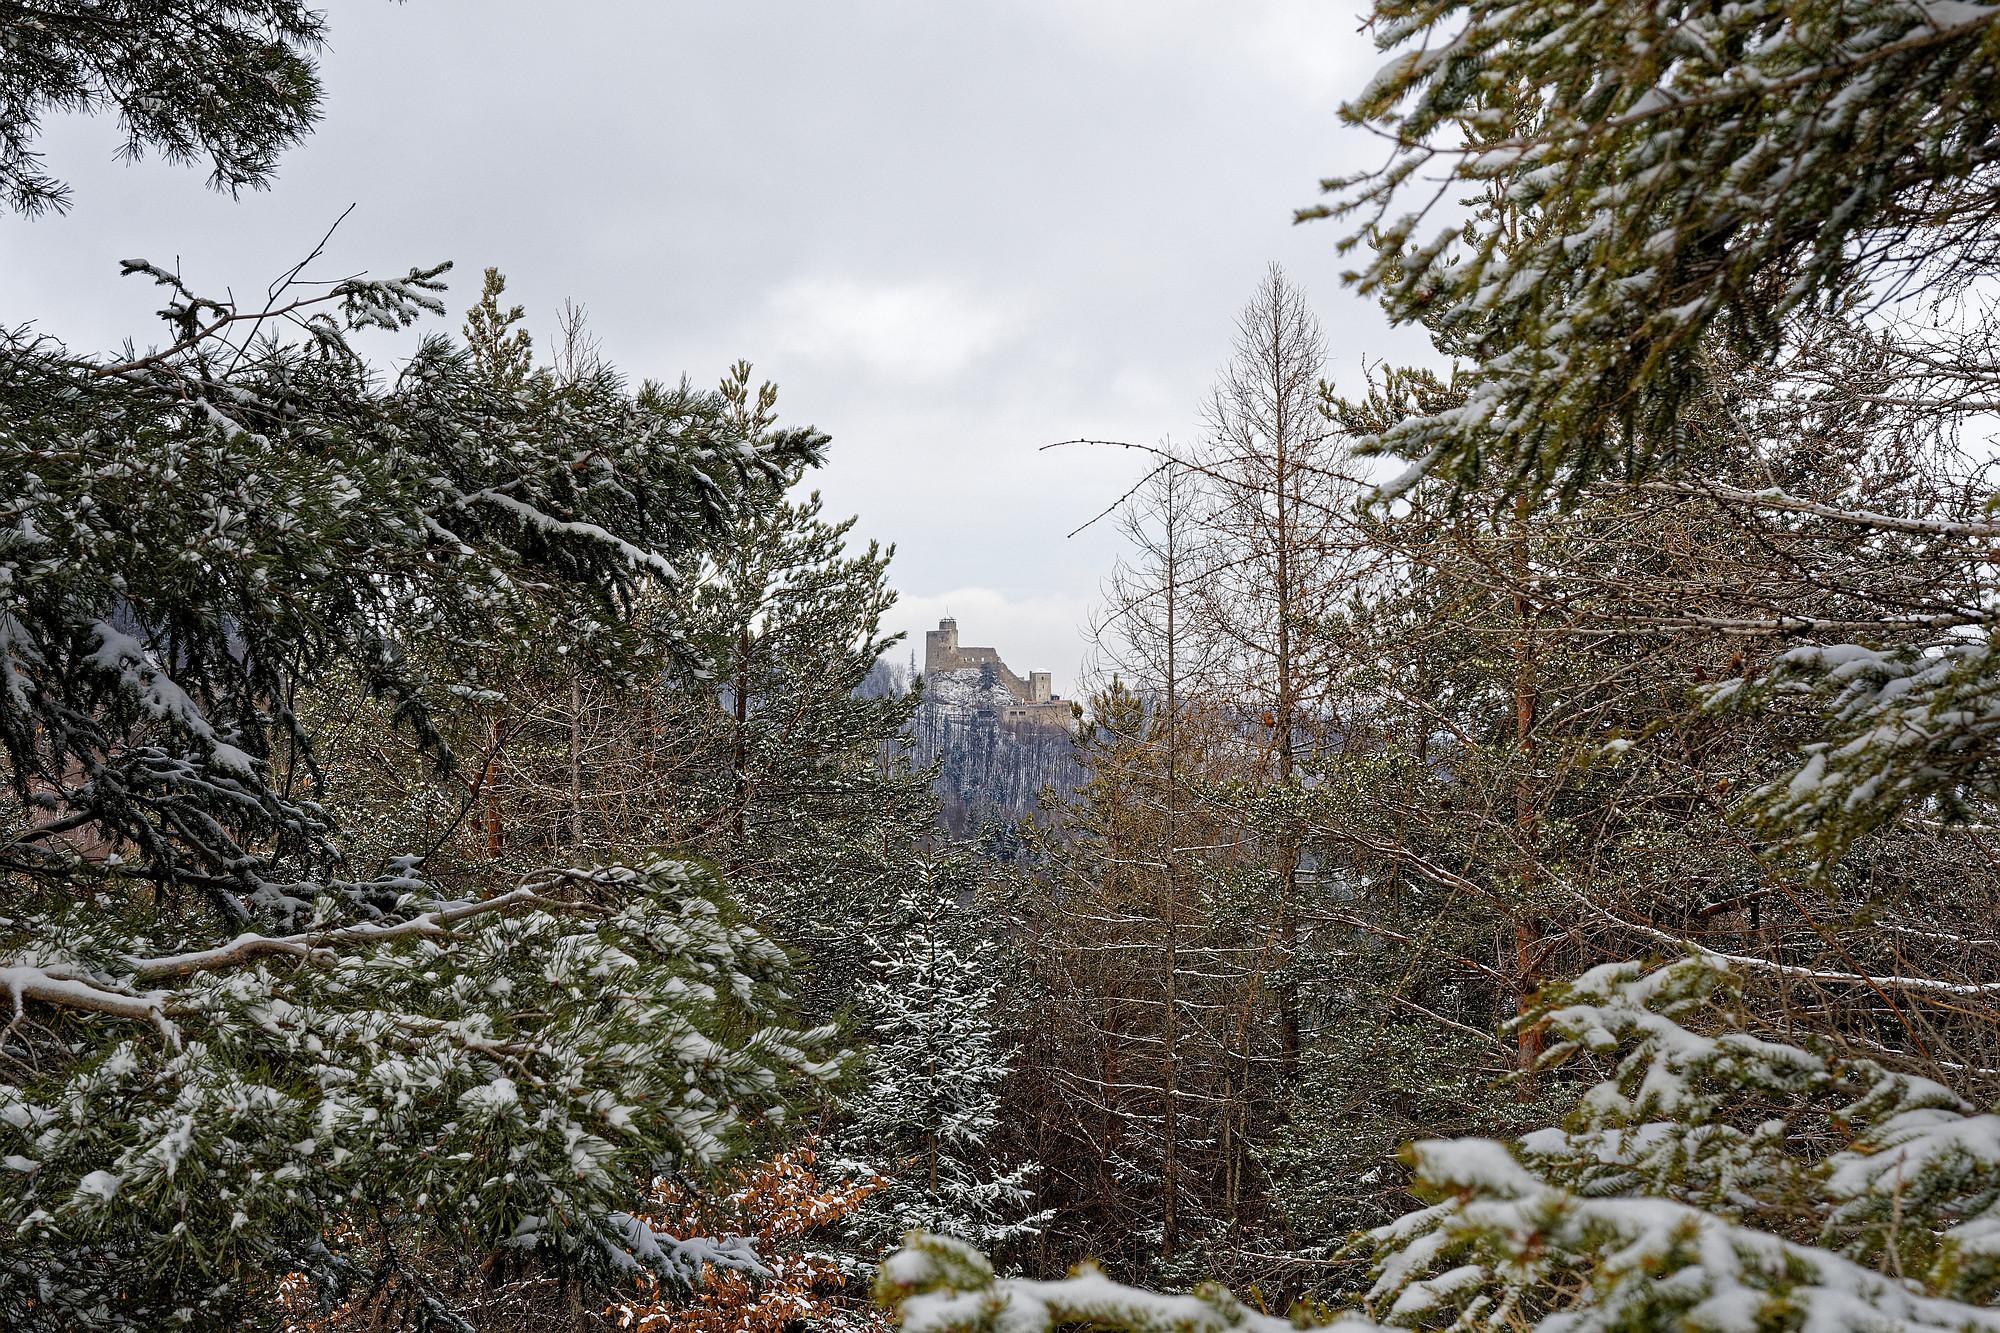 araburg im schnee 2021-02-04